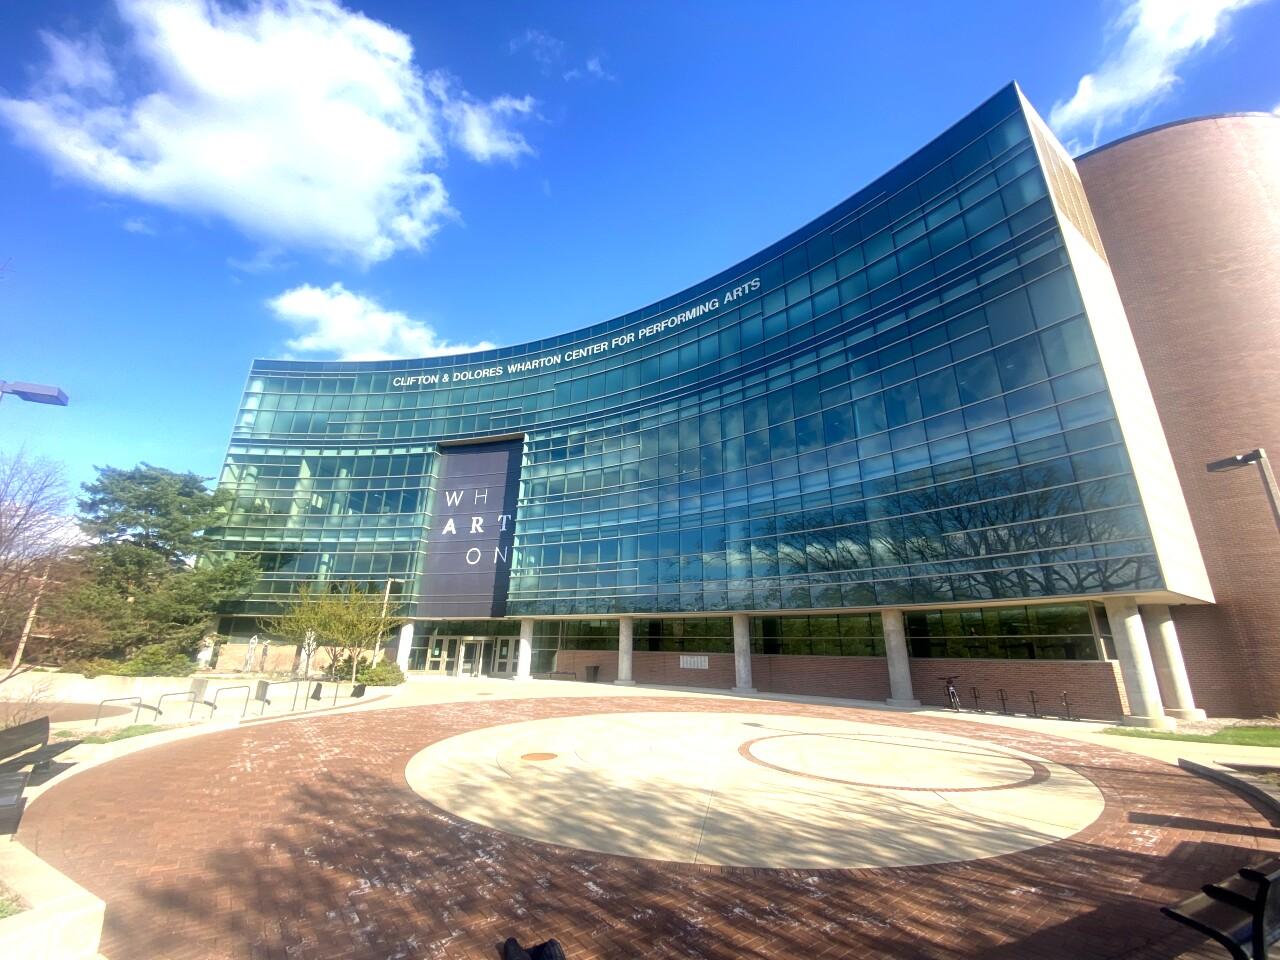 Wharton Center for performing arts